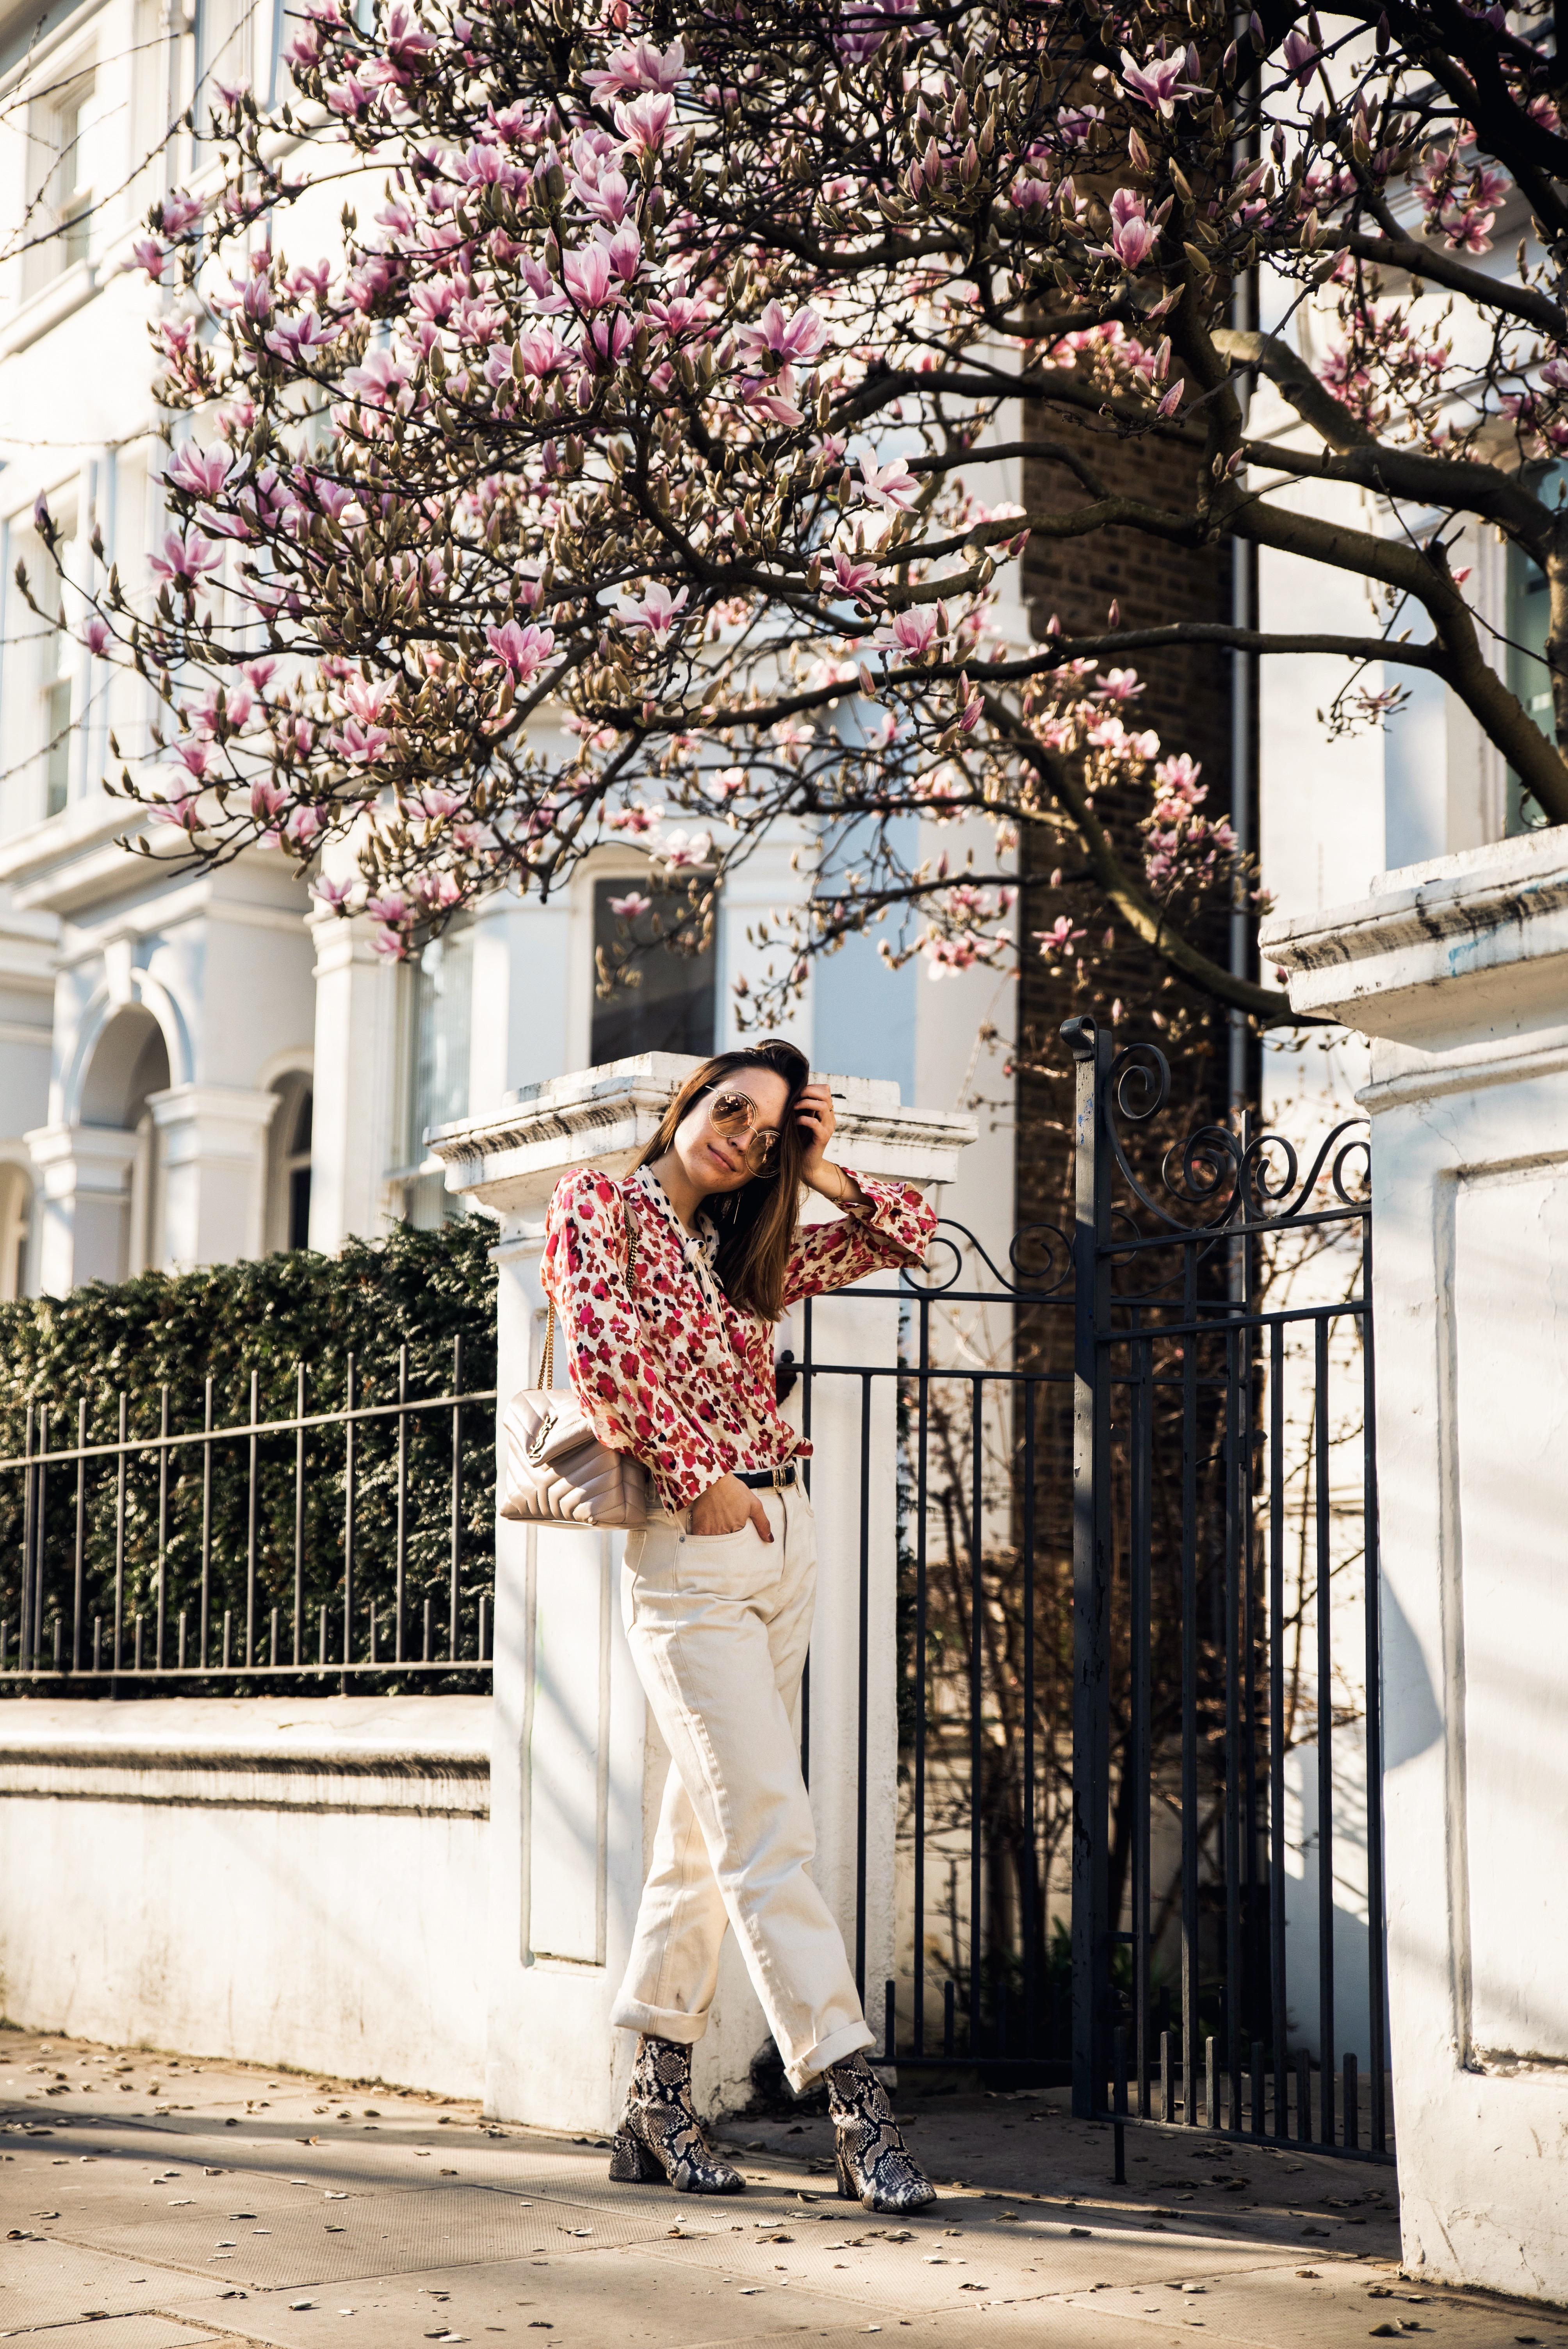 Frühlingshaftes Outfit mit pinker Bluse und weißer Jeans